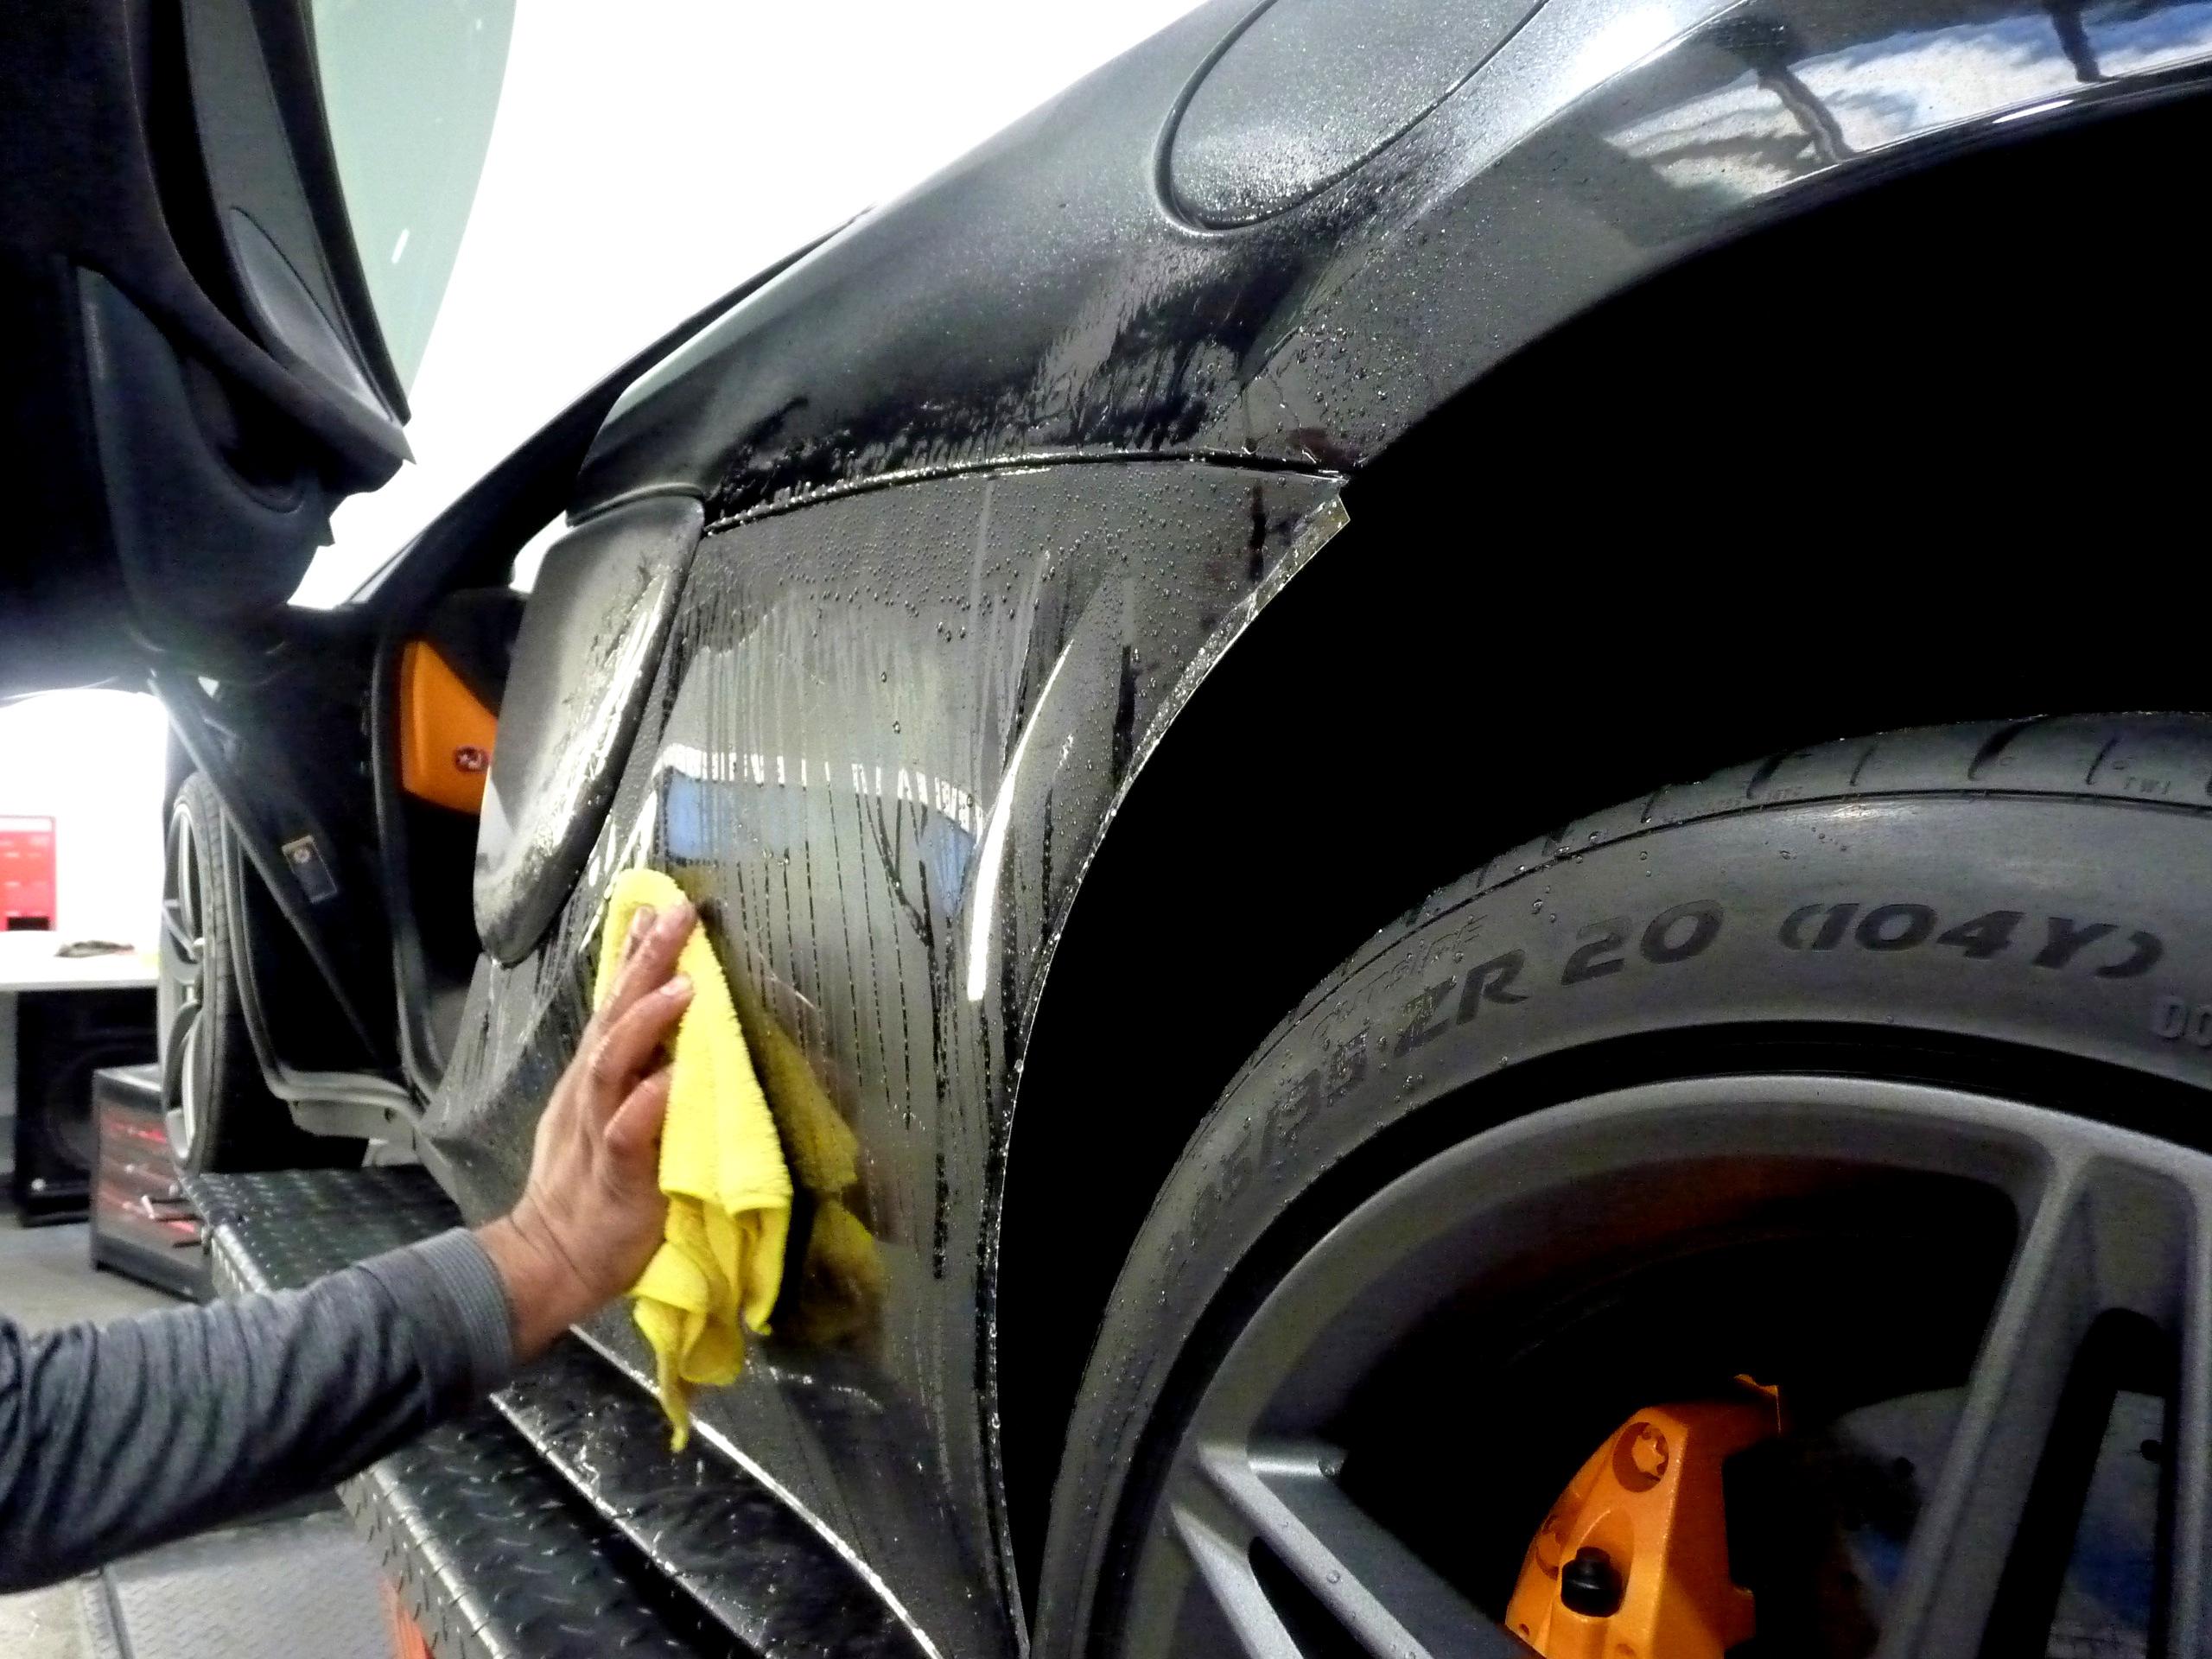 McLaren, 720s, 2018, 2017, 750s, supercar, roadster, car bra, stone chip film, paint protection film, winguard, adelaide, matte paint, car wrap, matt paint, XPEL, Ultimate, Stealth, Ultra, expert wrap, xpel, suntek, opticoat, stek, 3m, adelaide paint protection,  d and s, attention to detail, adelaide, south australia, elite, #love